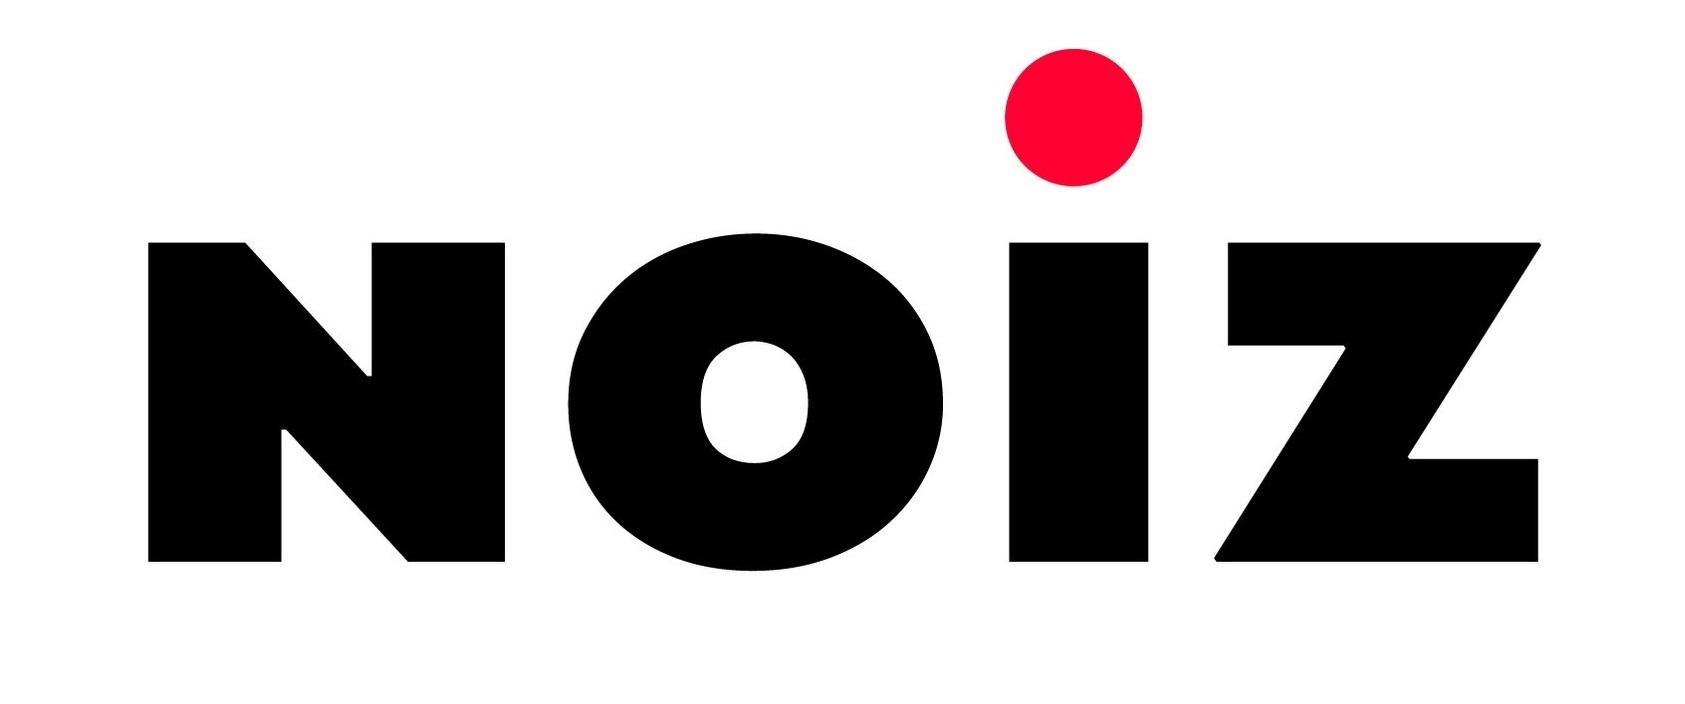 Final master logo design.